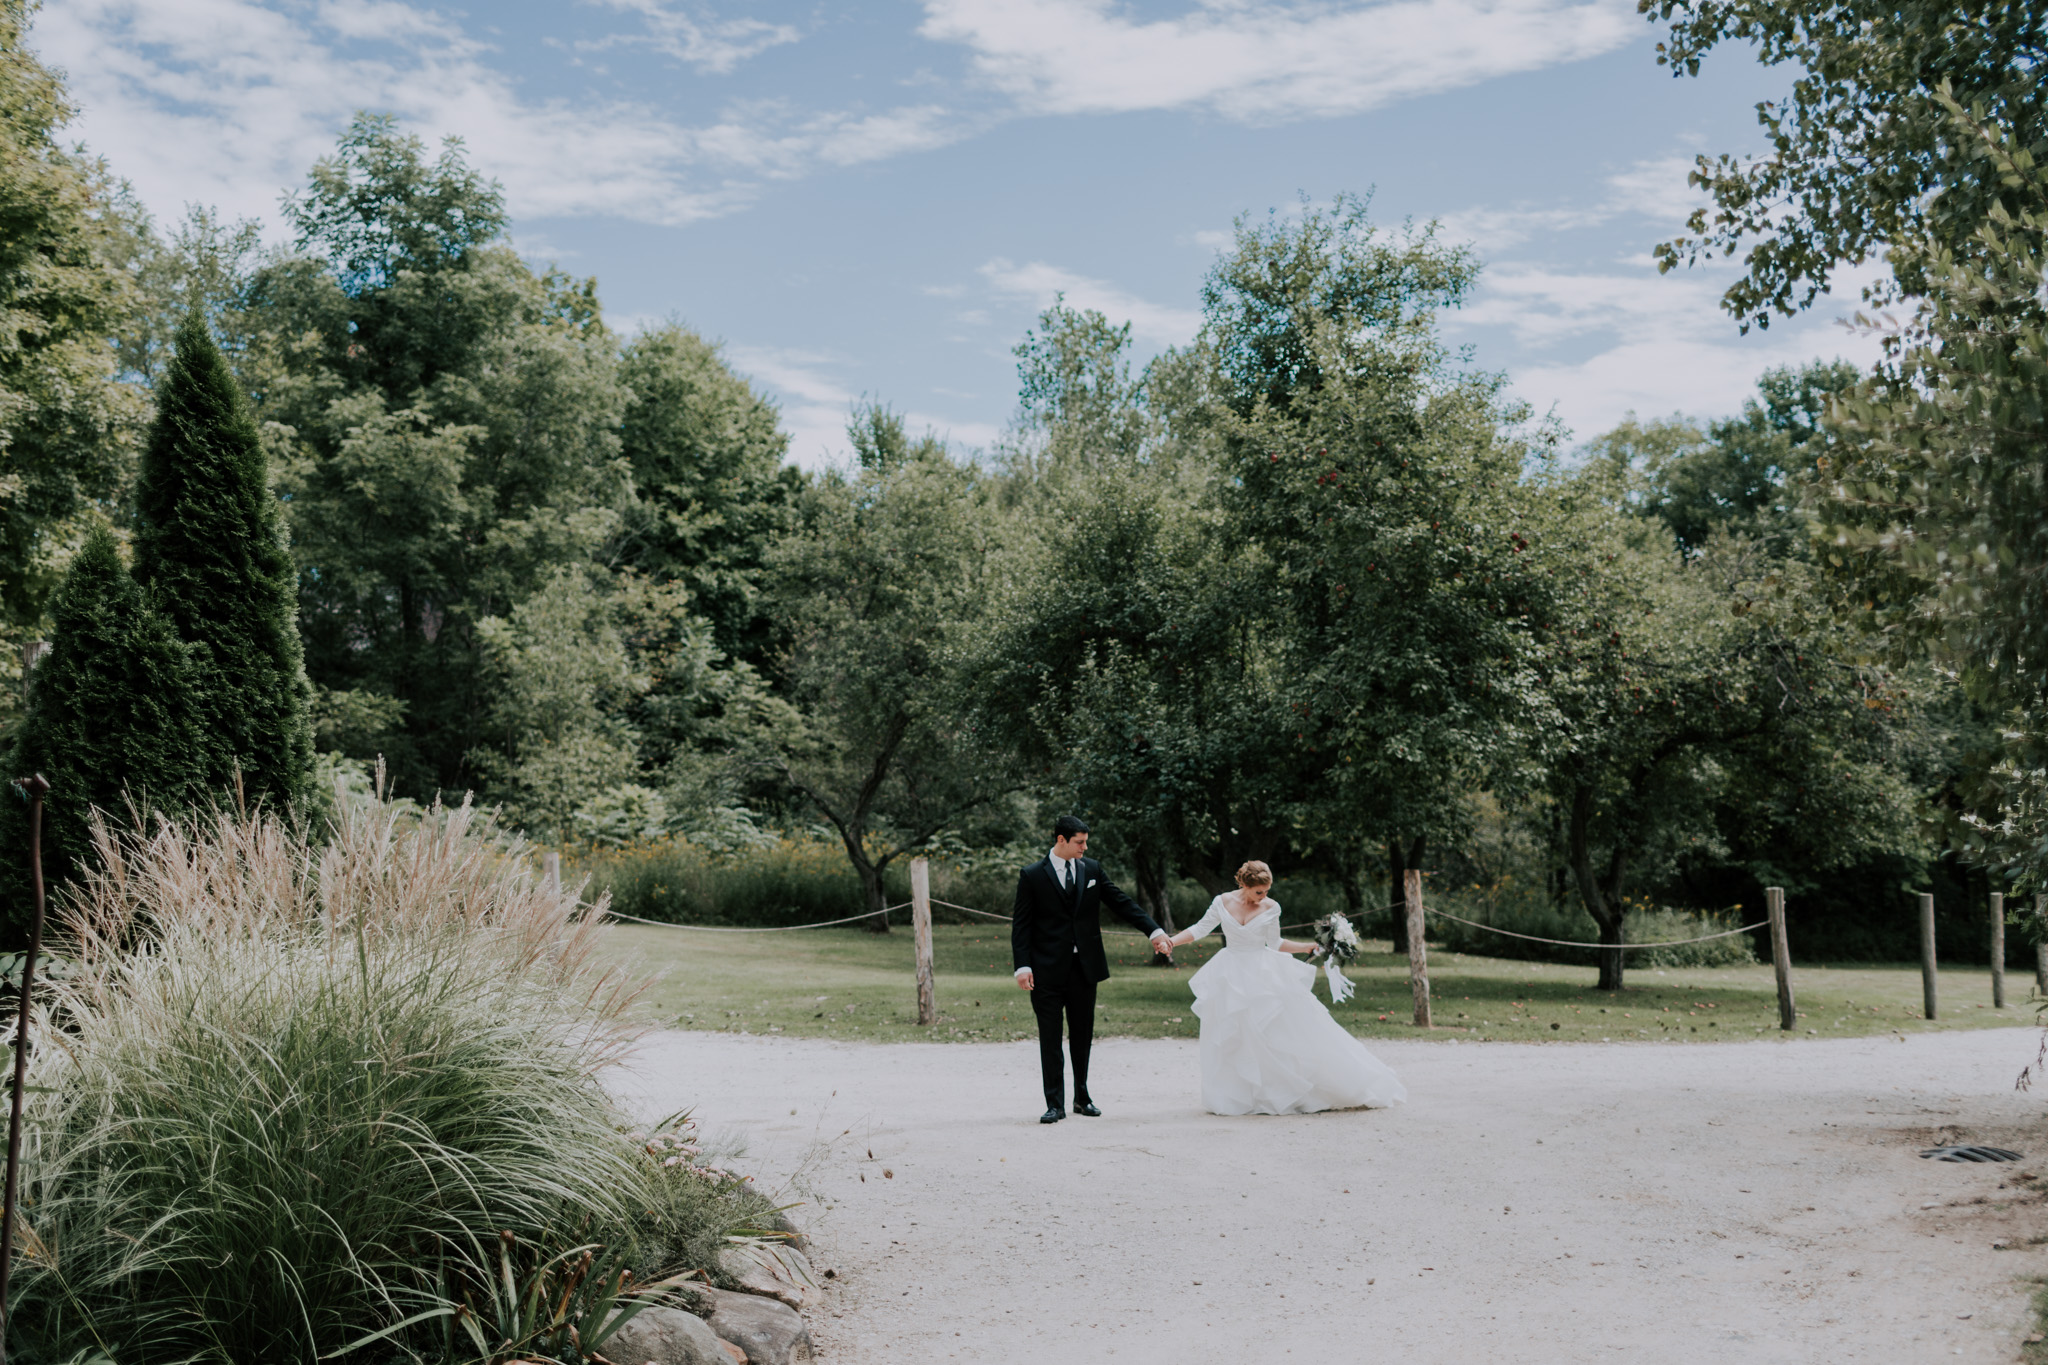 MillCreek-Wilde-Wedding-Barn-Michigan-Eliza-Eric-Vafa-Photo384.jpg